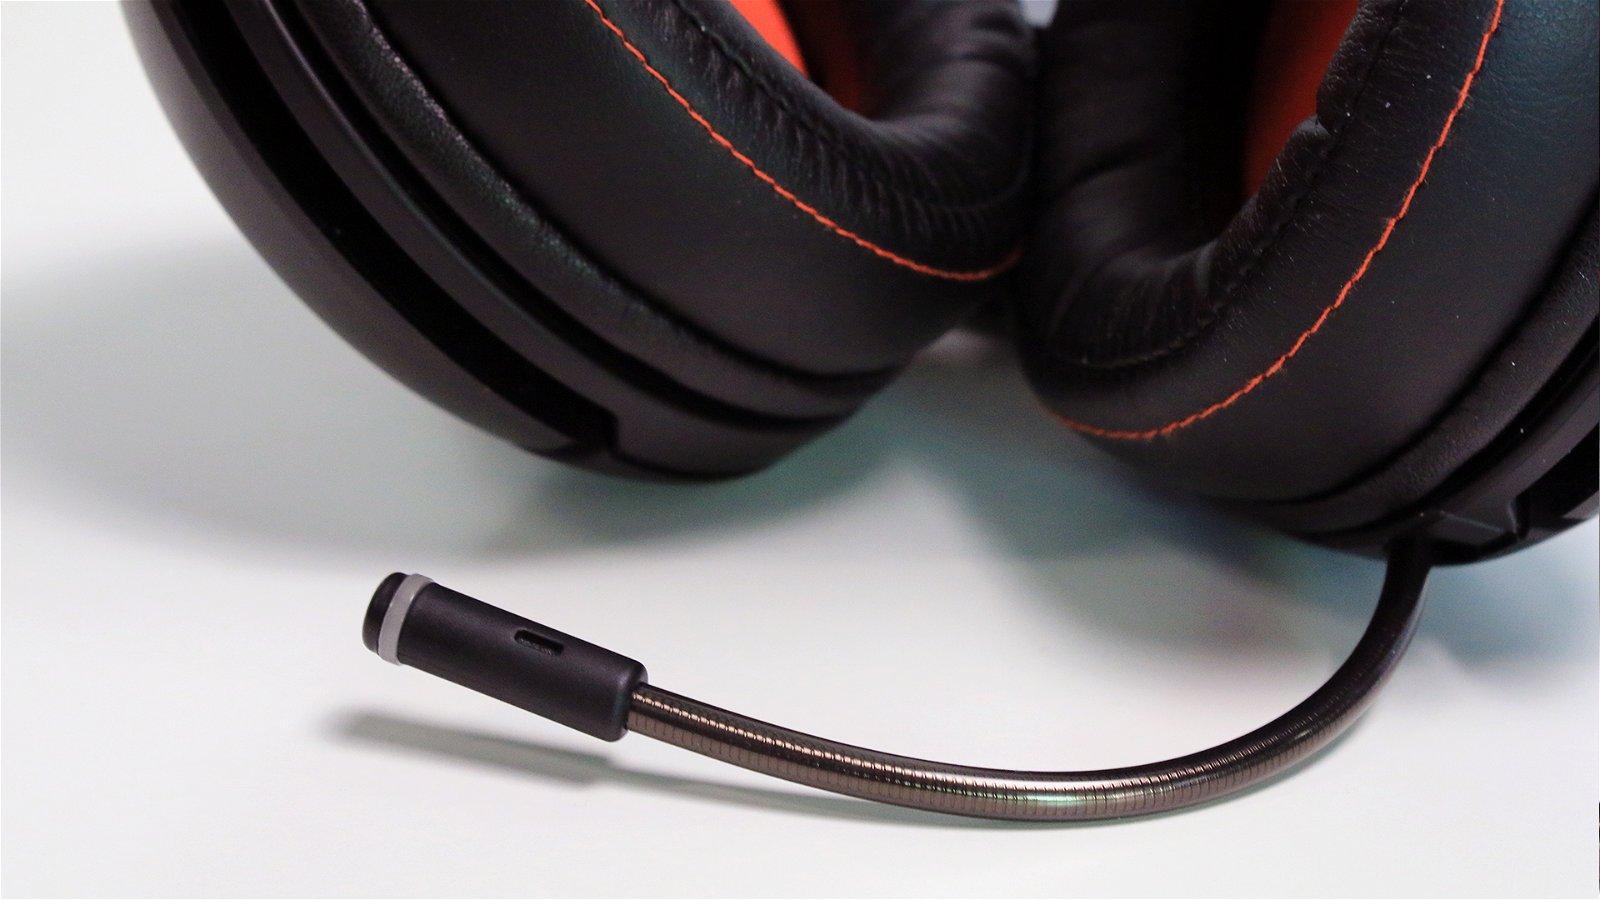 Steelseries Siberia 800 Gaming Headset (Hardware) Review 7